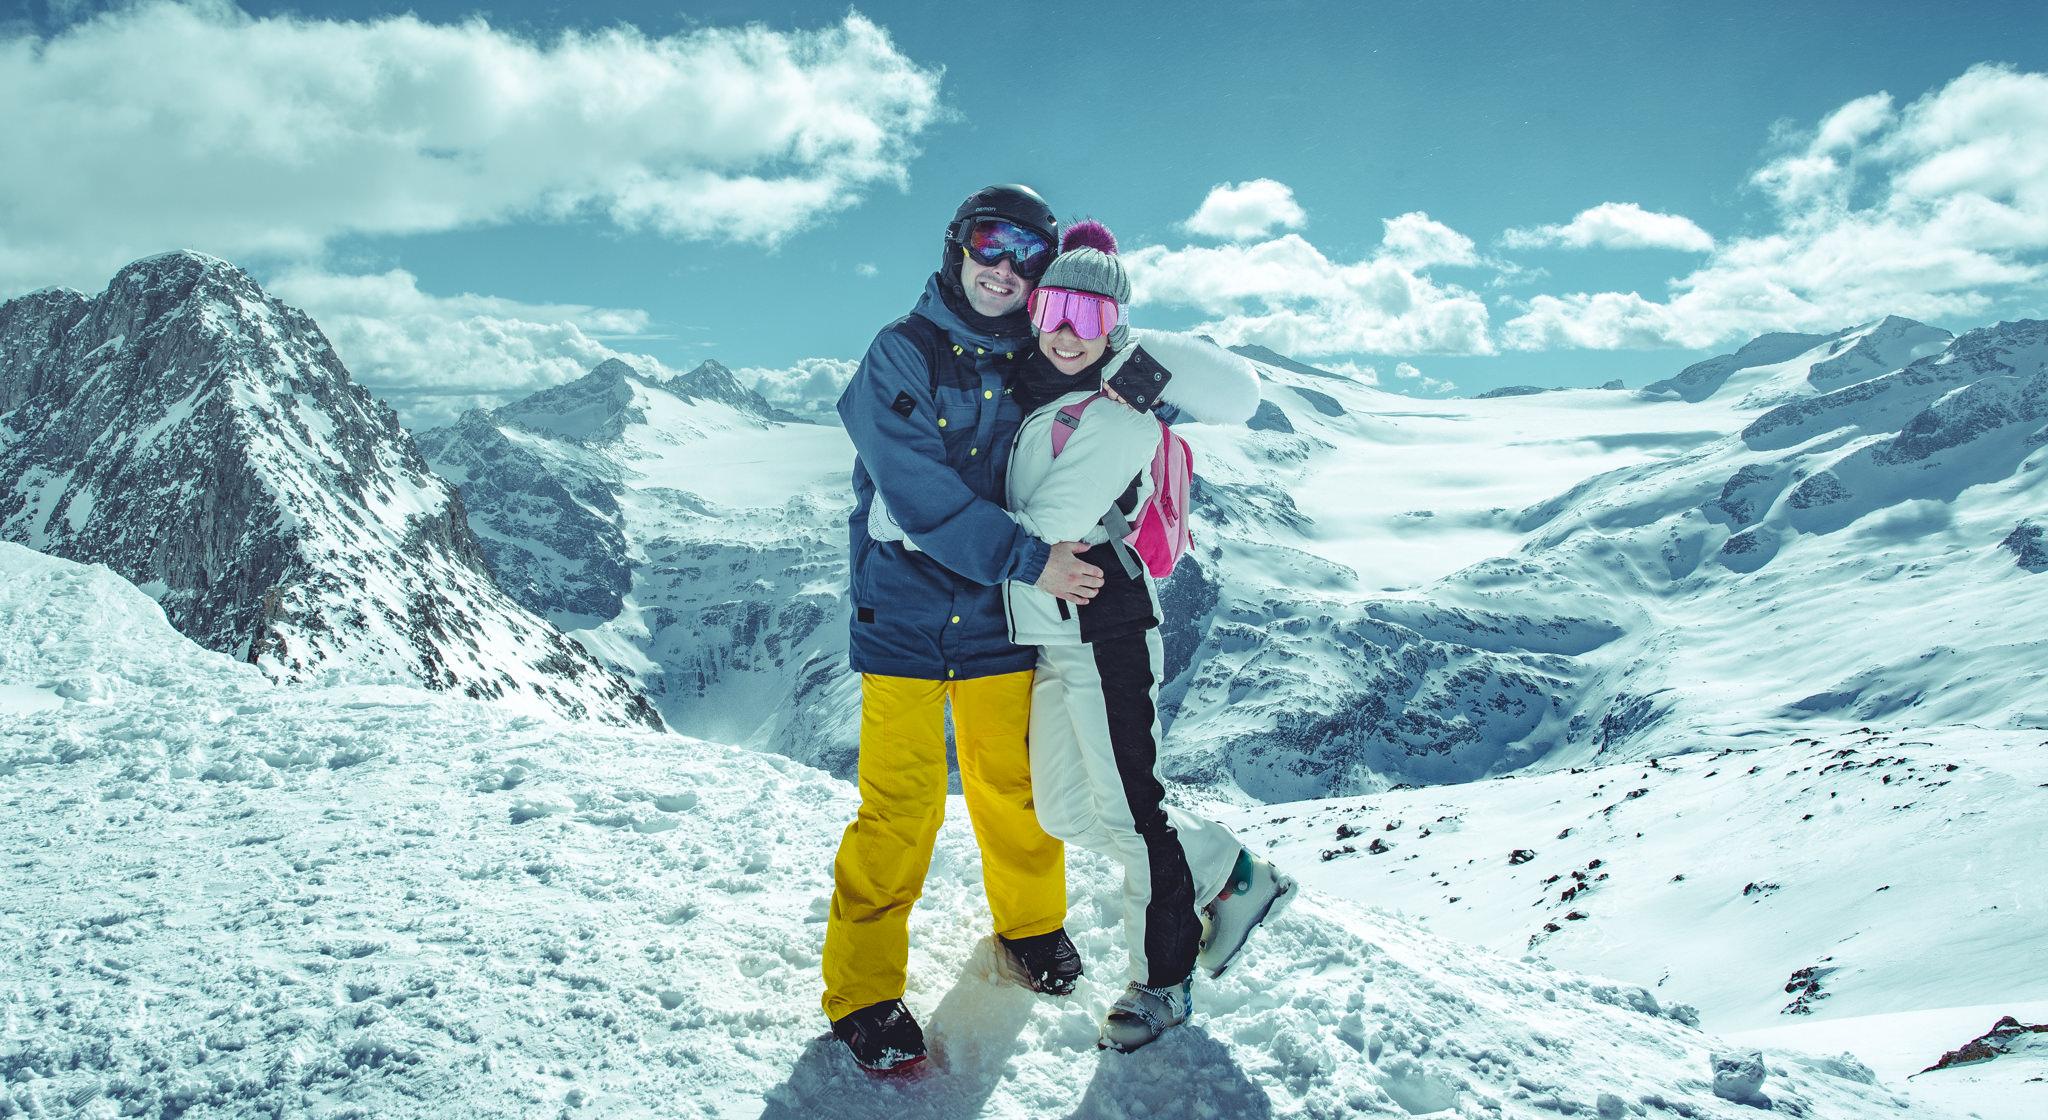 Ski-Holiday-Italy-20170307-0496-Kris-Askey.jpg